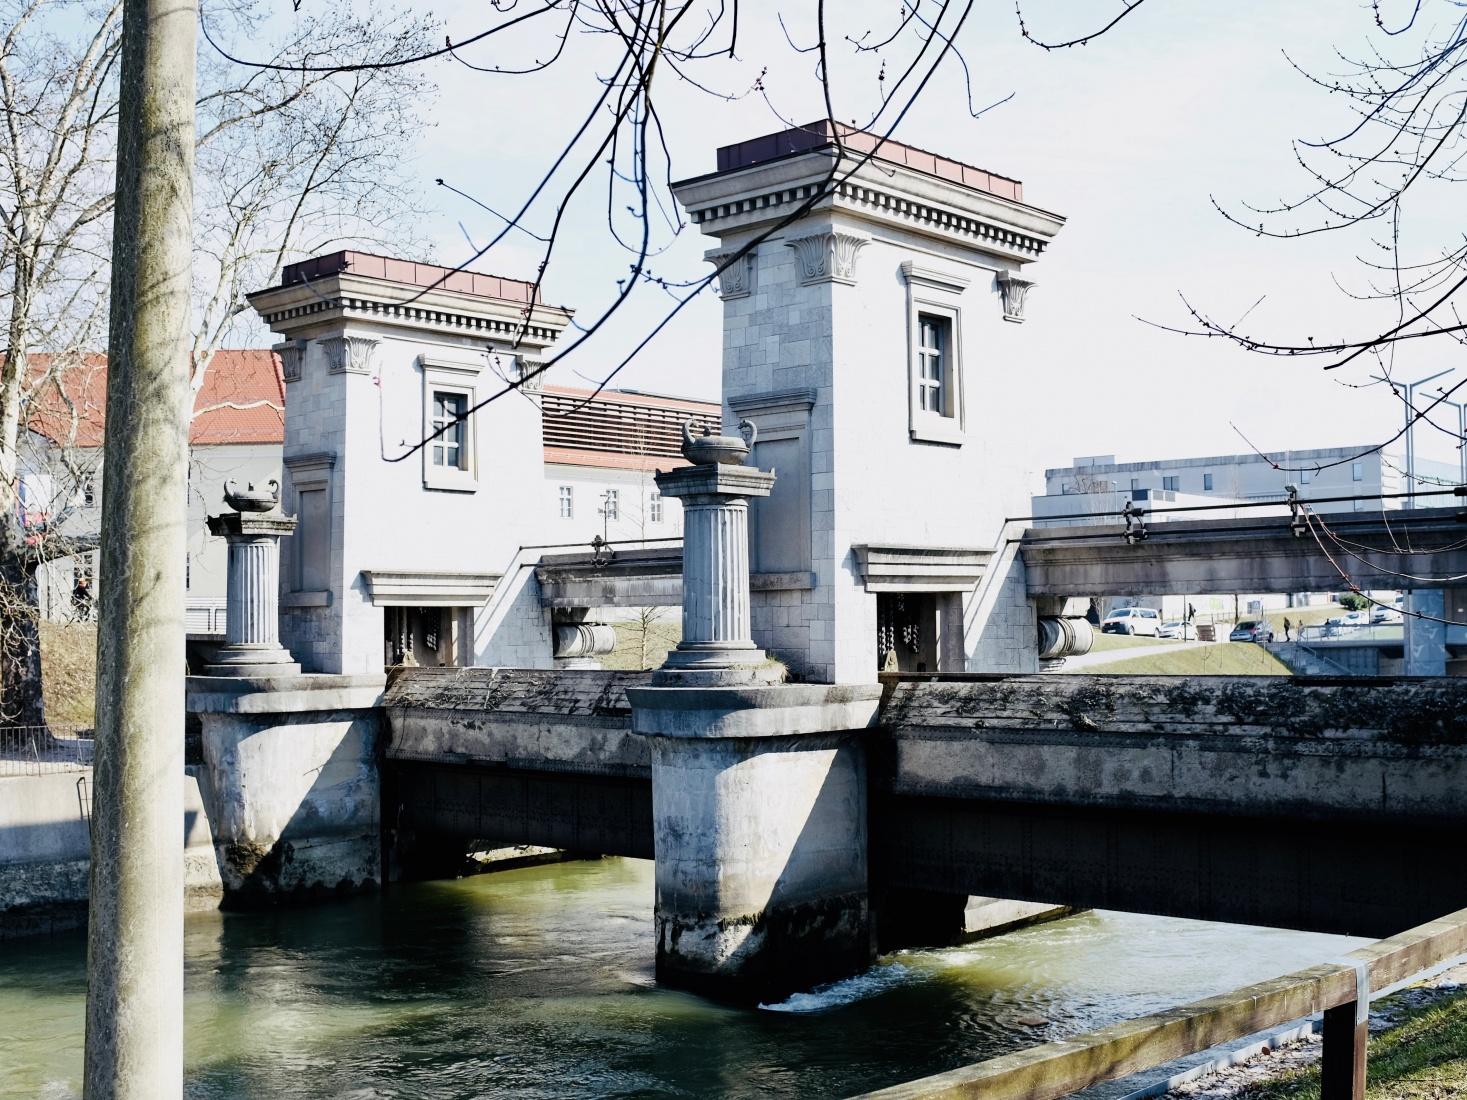 A lock over the Ljubljanica River, designed by Slovenian architect Jože Plečnik, resembling Ancient Roman pillars and architecture, in Ljubljana, Slovenia.